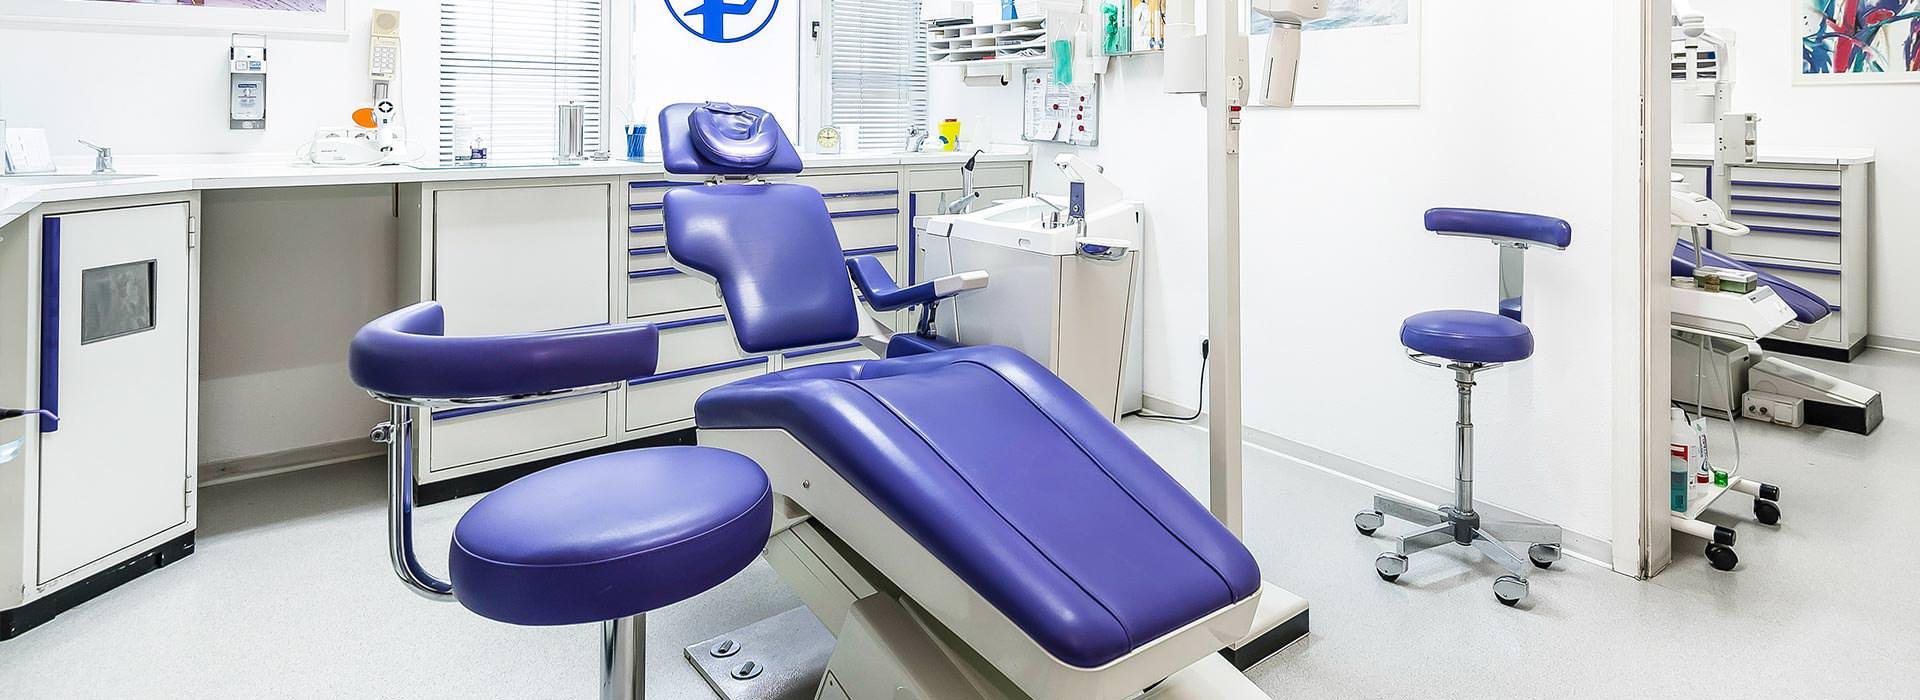 Behandlungszimmer 8 in der Zahnarztpraxis Münsing